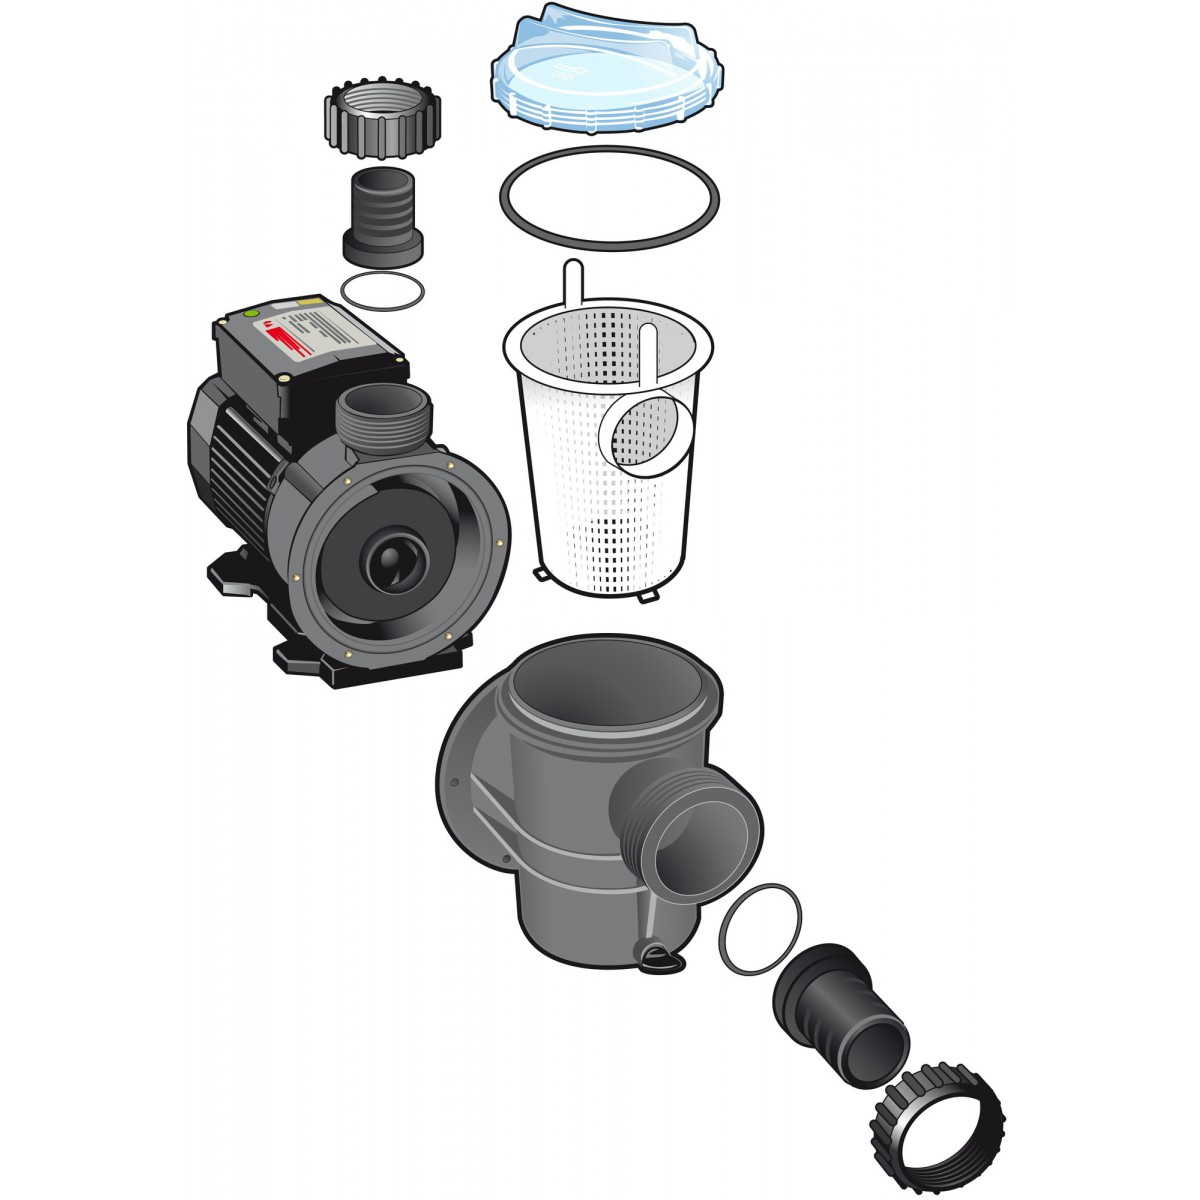 Pompe piscine Poolmax® TP150 Ubbink - 21,6 m³/h